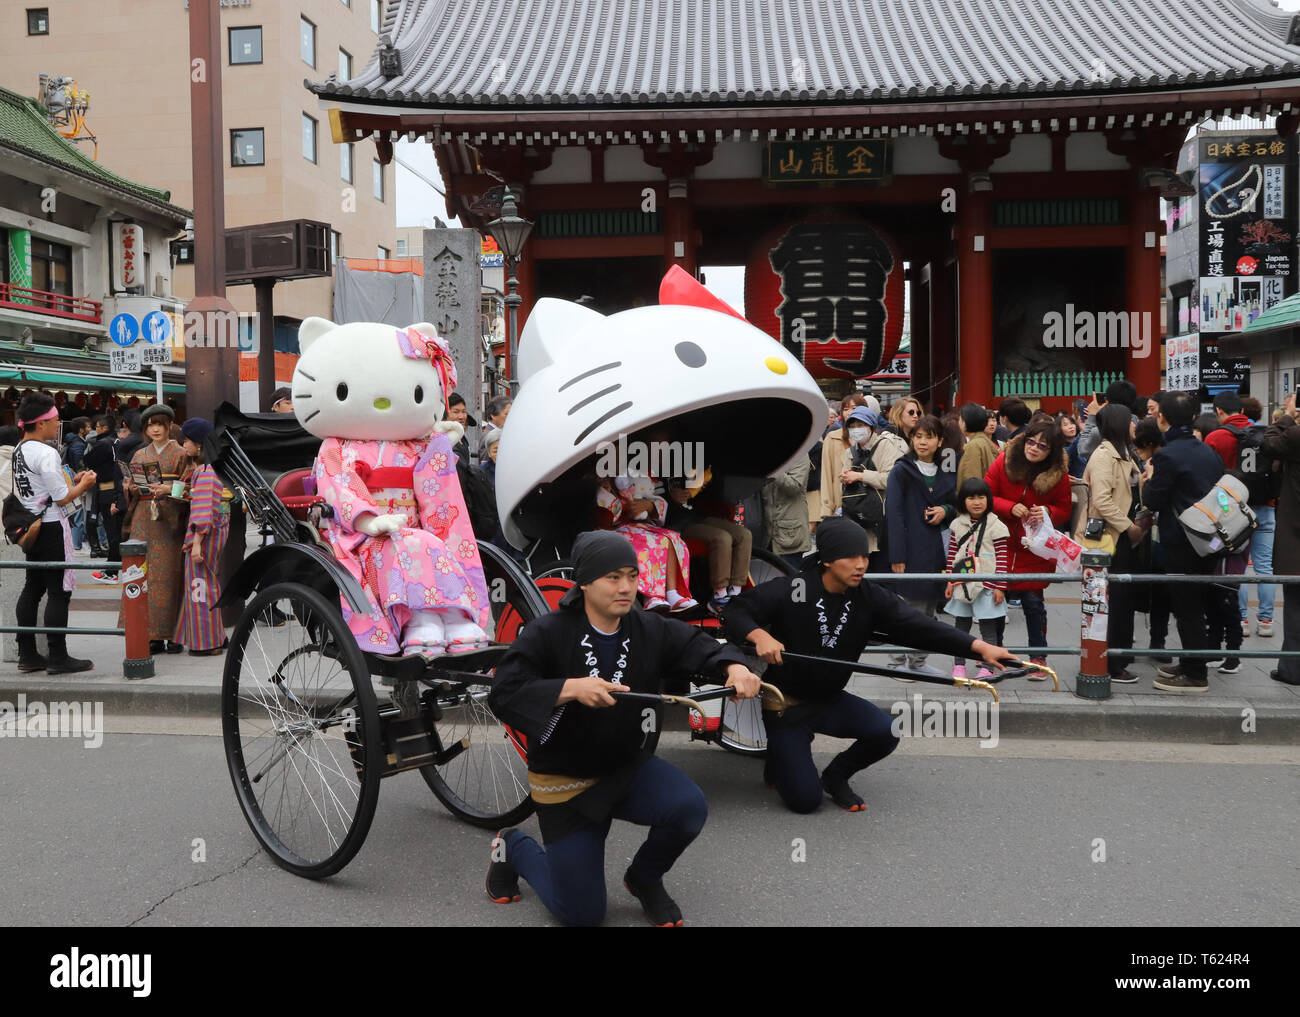 78debe849 tokyo-japan-27th-apr-2019-japanese-character-giant-sanrios-hello-kitty -in-kimono-dress-rides-a-rickshaw-at-asakusa-district-as-sanrio-opens-a-new- shop- ...